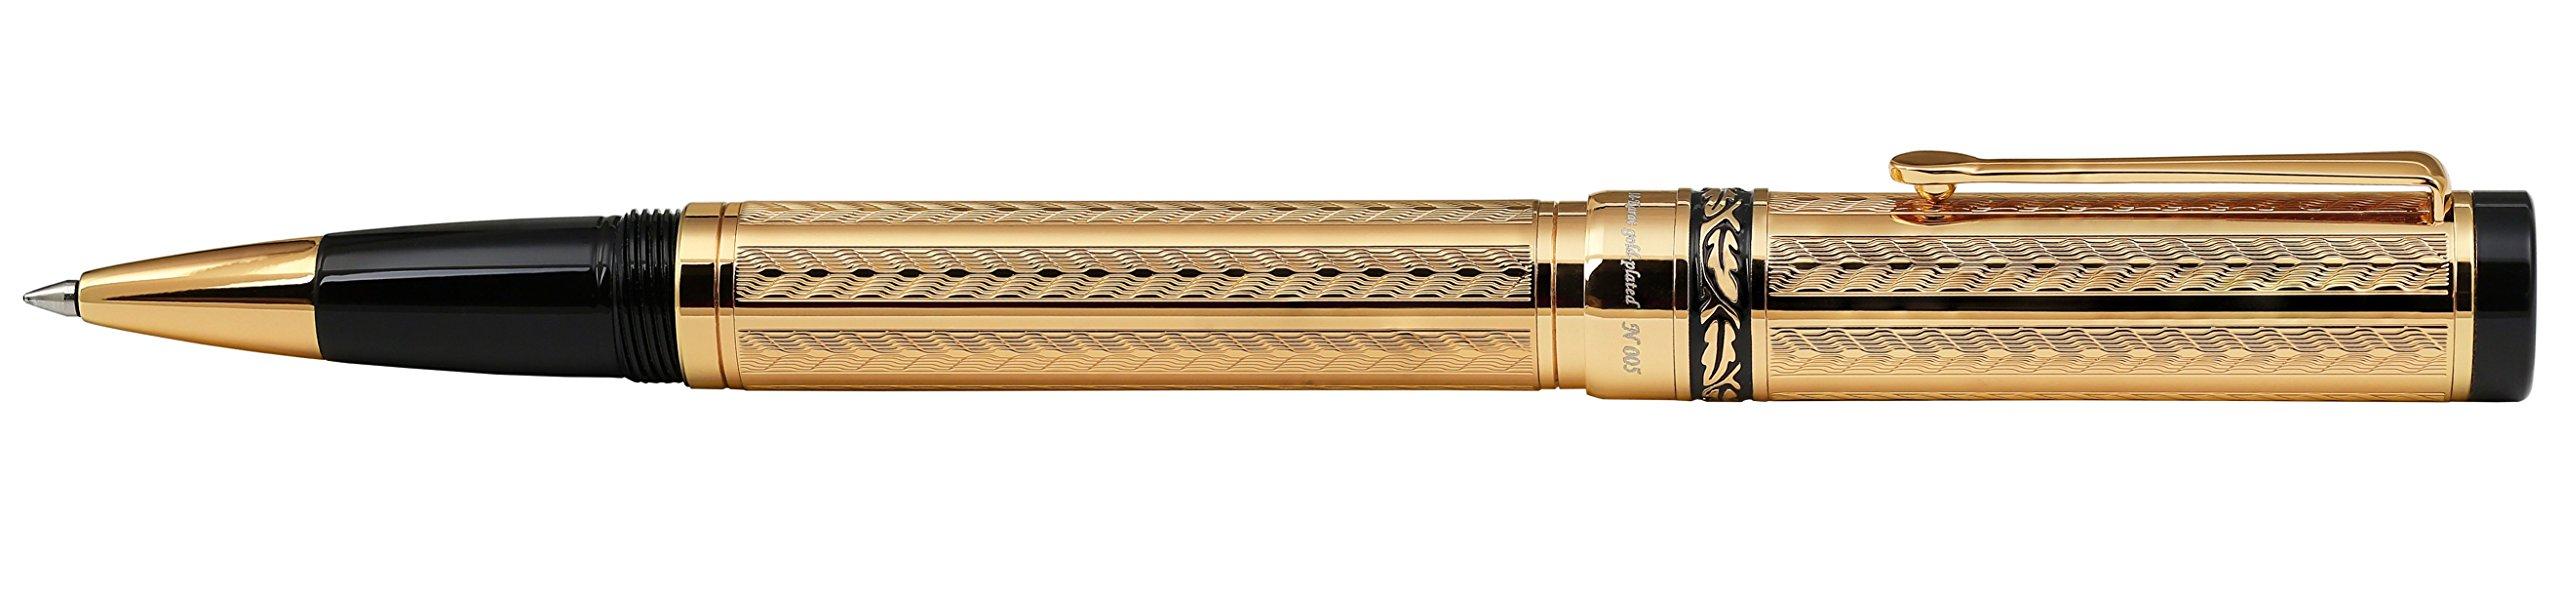 Xezo Diamond-Cut 18-Karat Gold Layered Weighty Fine Rollerball Pen. Screw-on cap (Tribune Gold RG) by Xezo (Image #4)